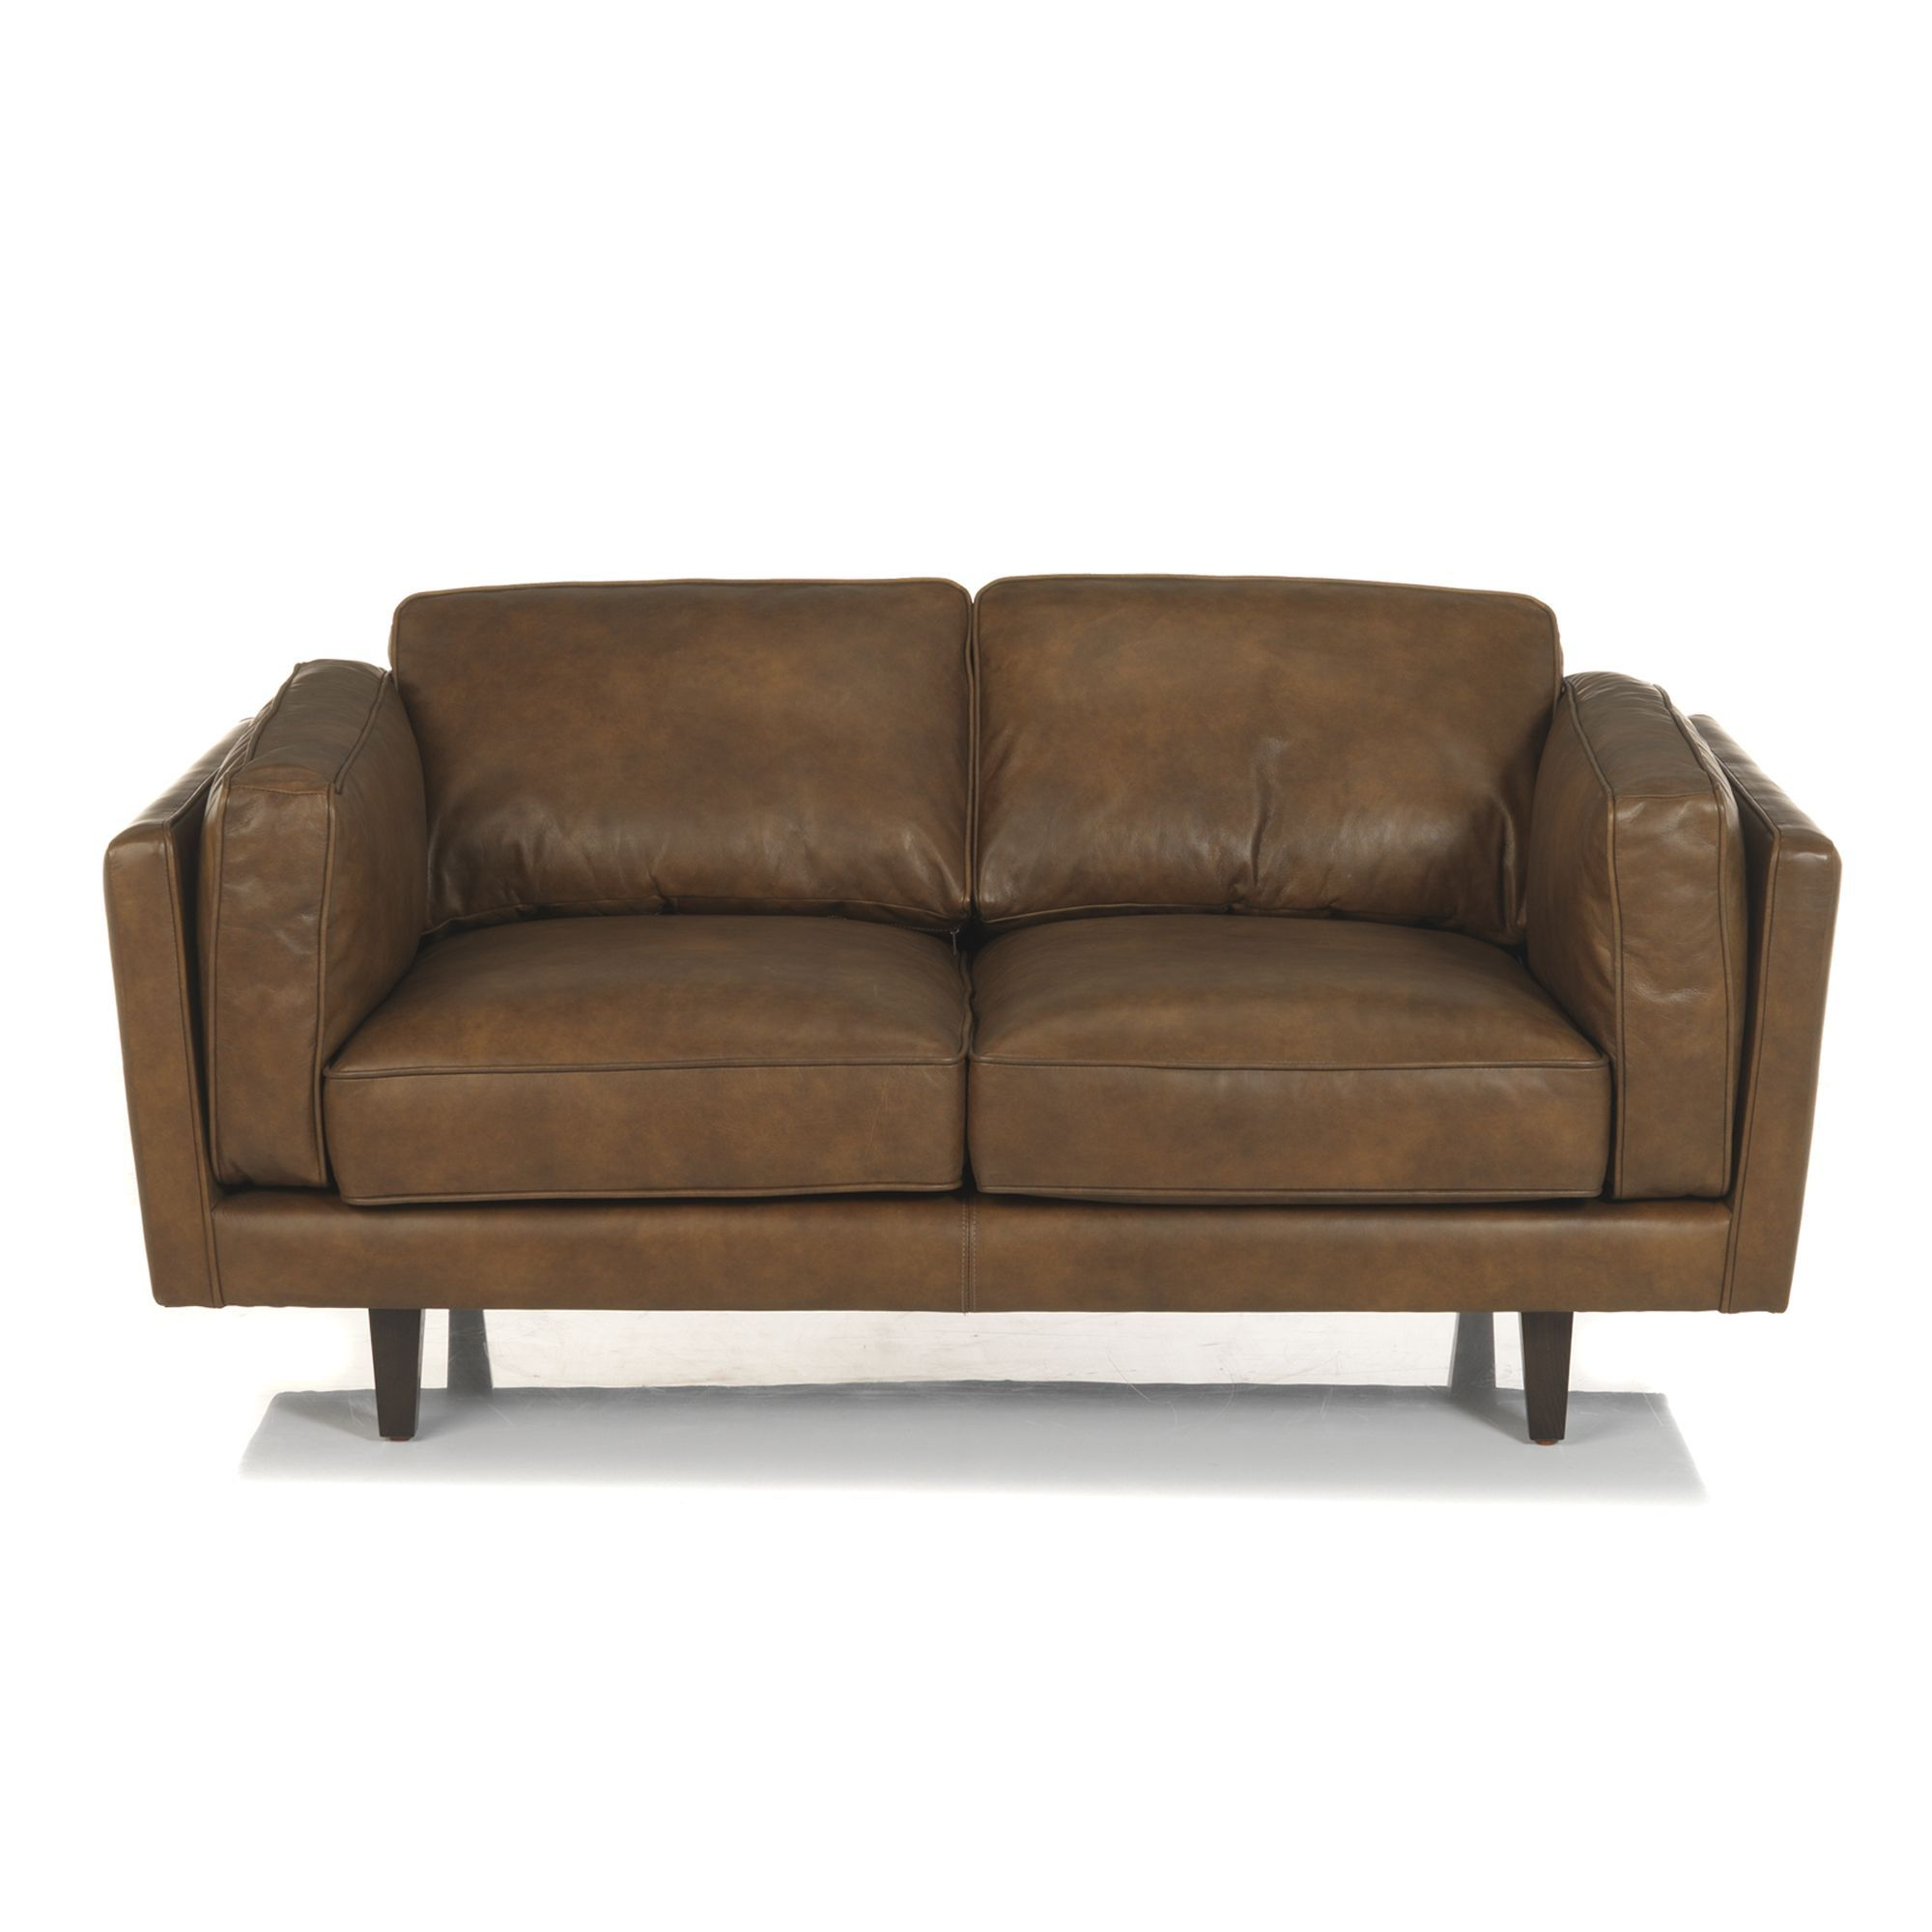 canap en cuir vachette 2 places camel brooklyn salon. Black Bedroom Furniture Sets. Home Design Ideas